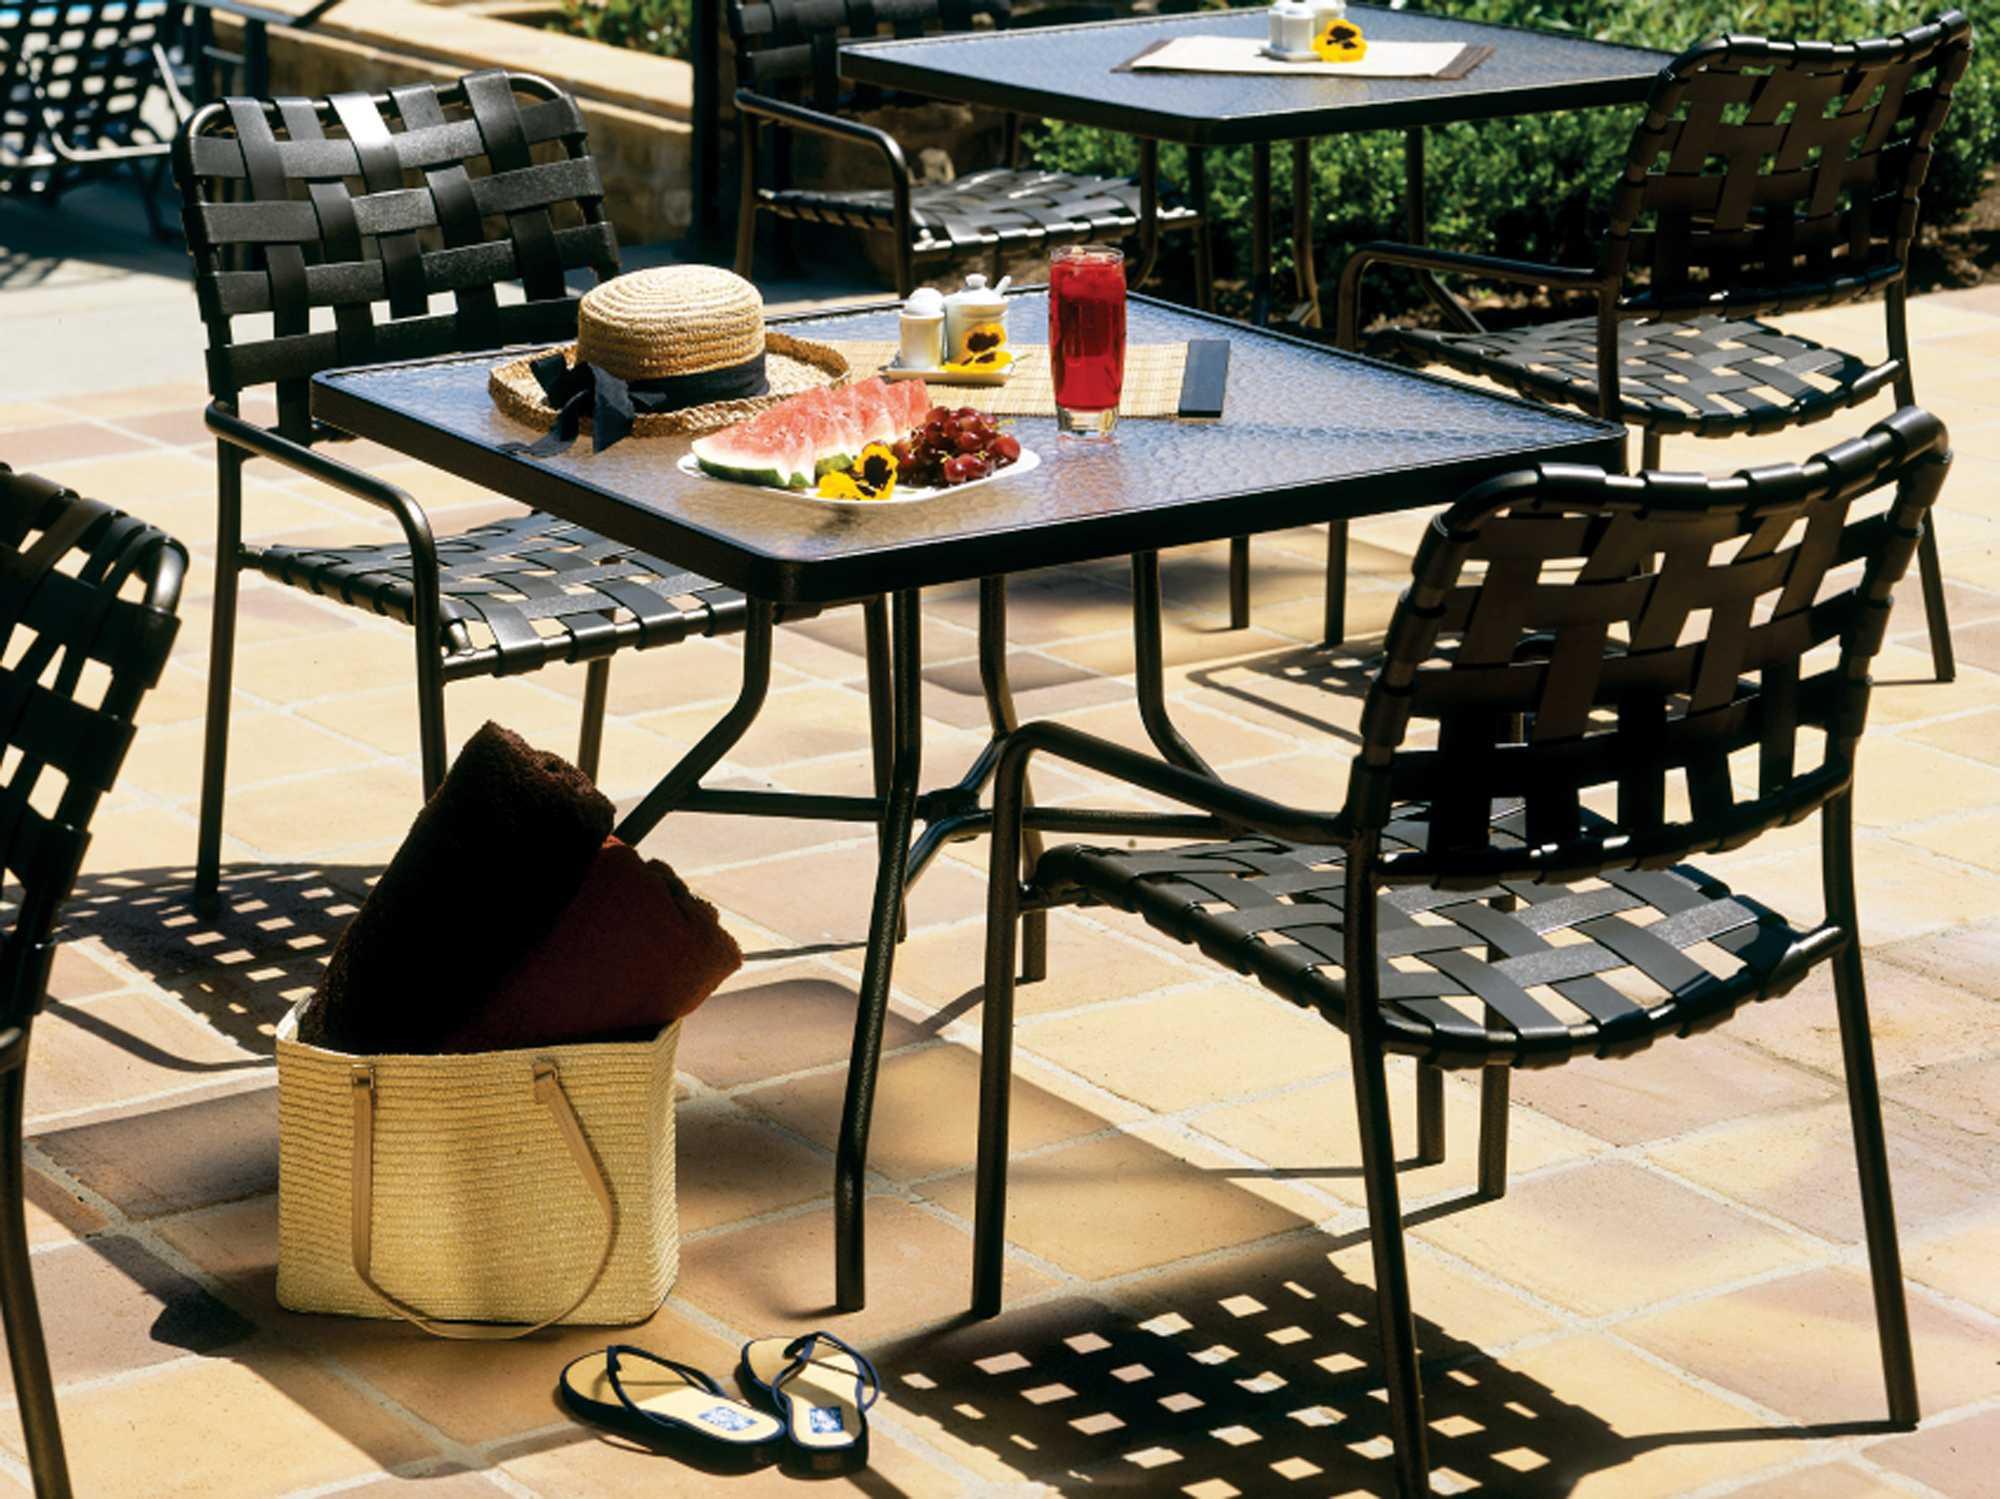 Tropitone Kahana Cross Strap Aluminum Stackable Dining Chair - Tropitone outdoor furniture